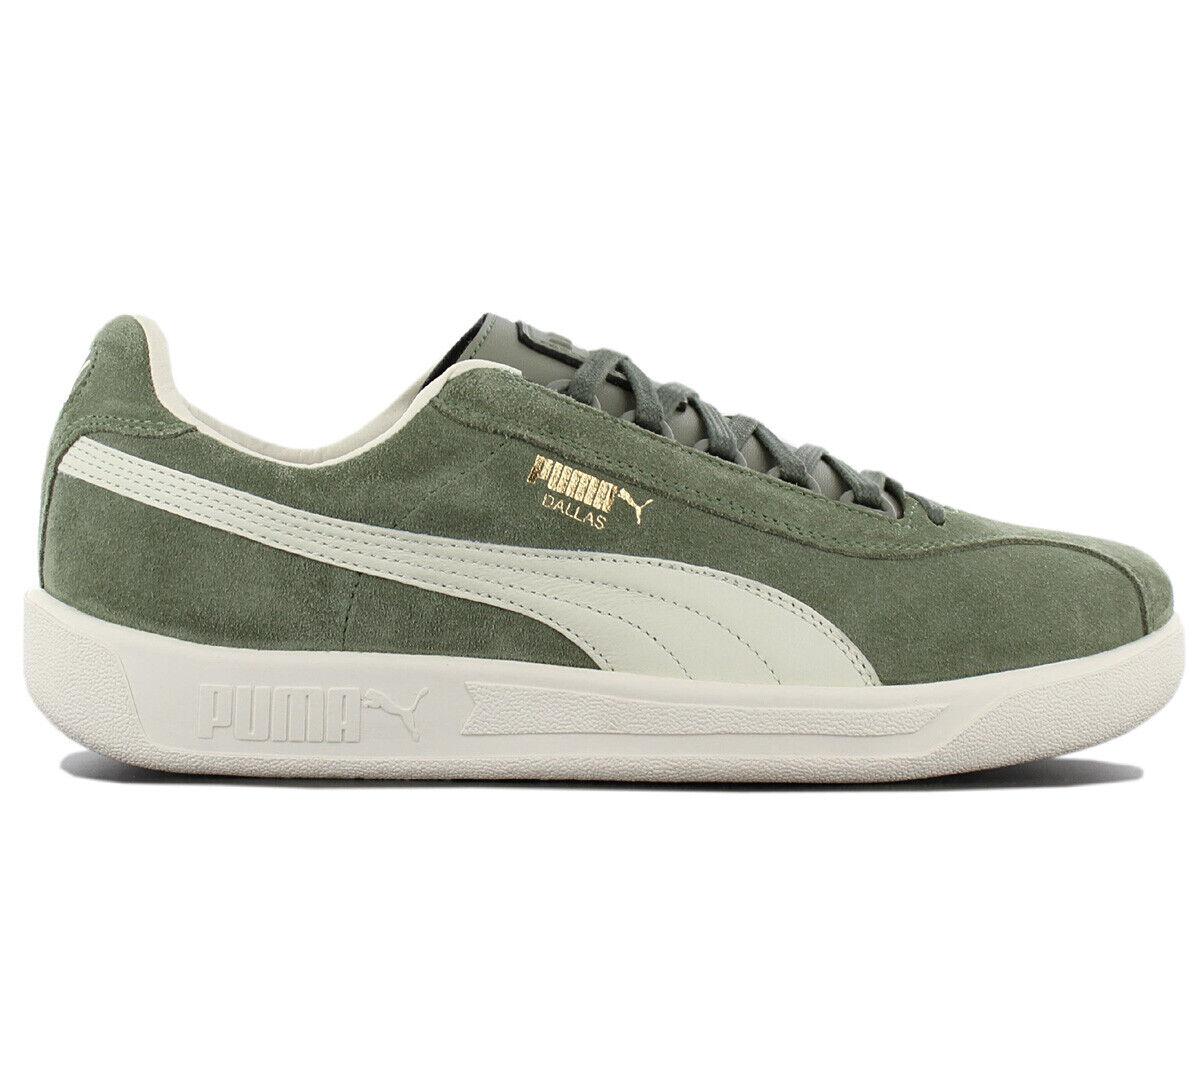 Skechers Herren Sneaker olivgrün 40 95164 günstig kaufen | eBay 8x9GV